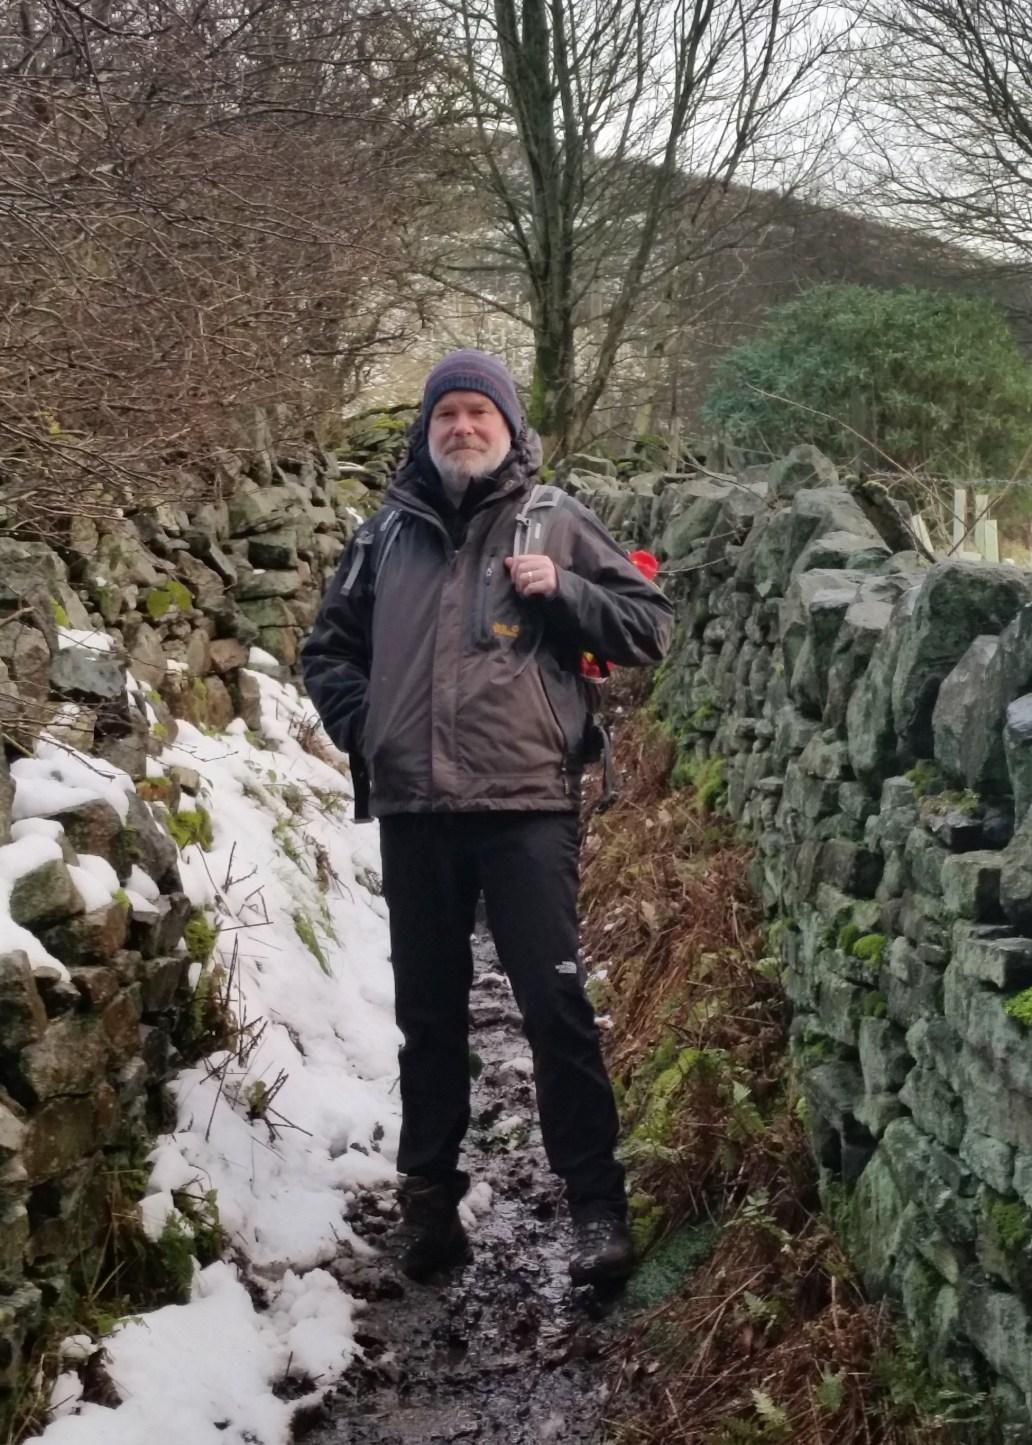 Kit Review The North Face Diablo Pants moors walk